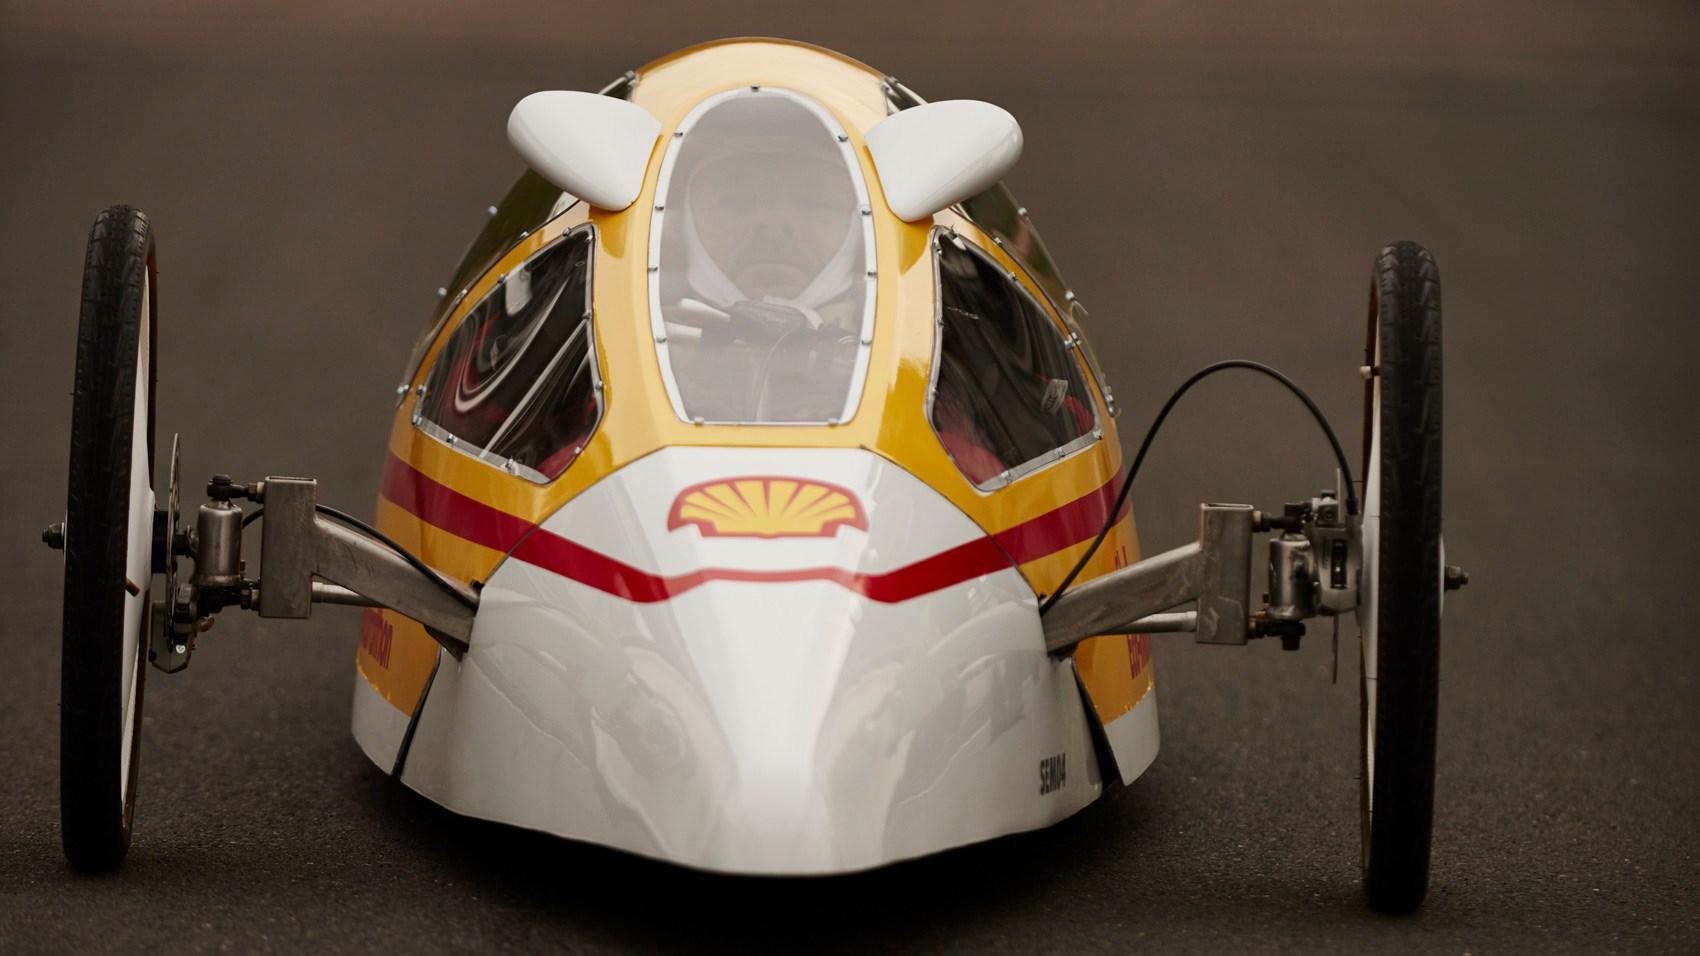 Shell Eco-Marathon prototype front